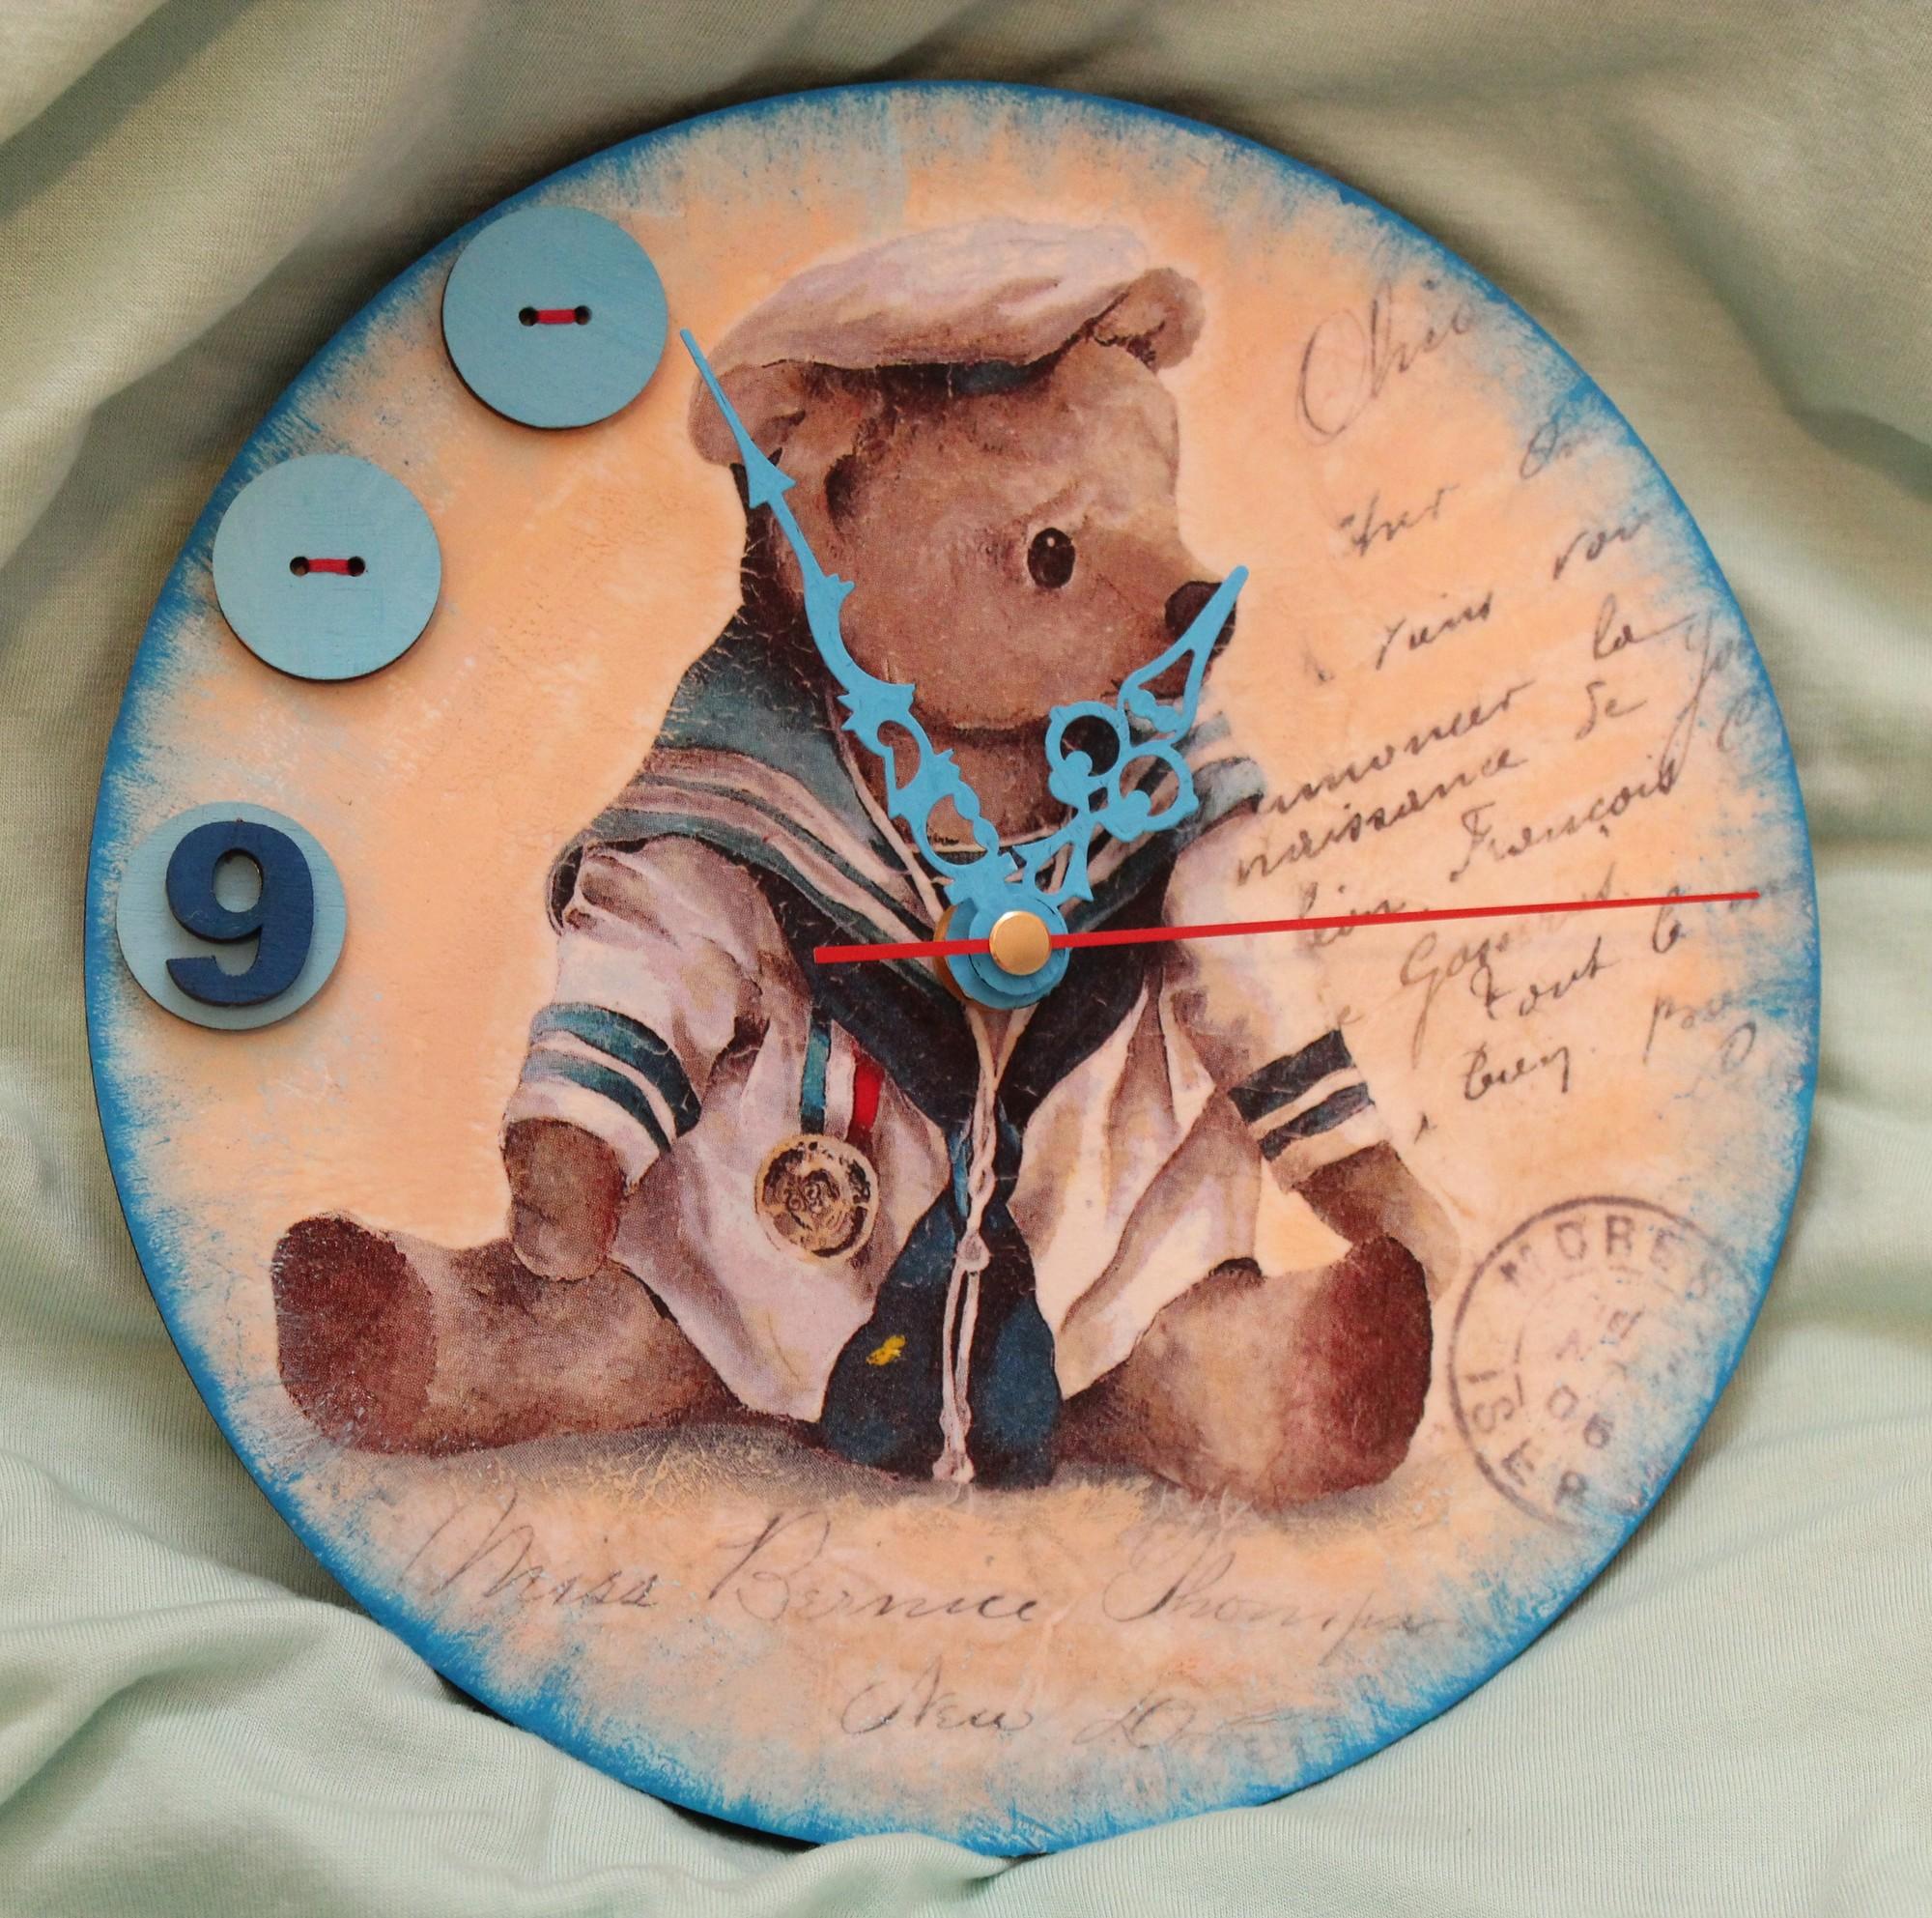 Вязание спицами свитера фото с описанием